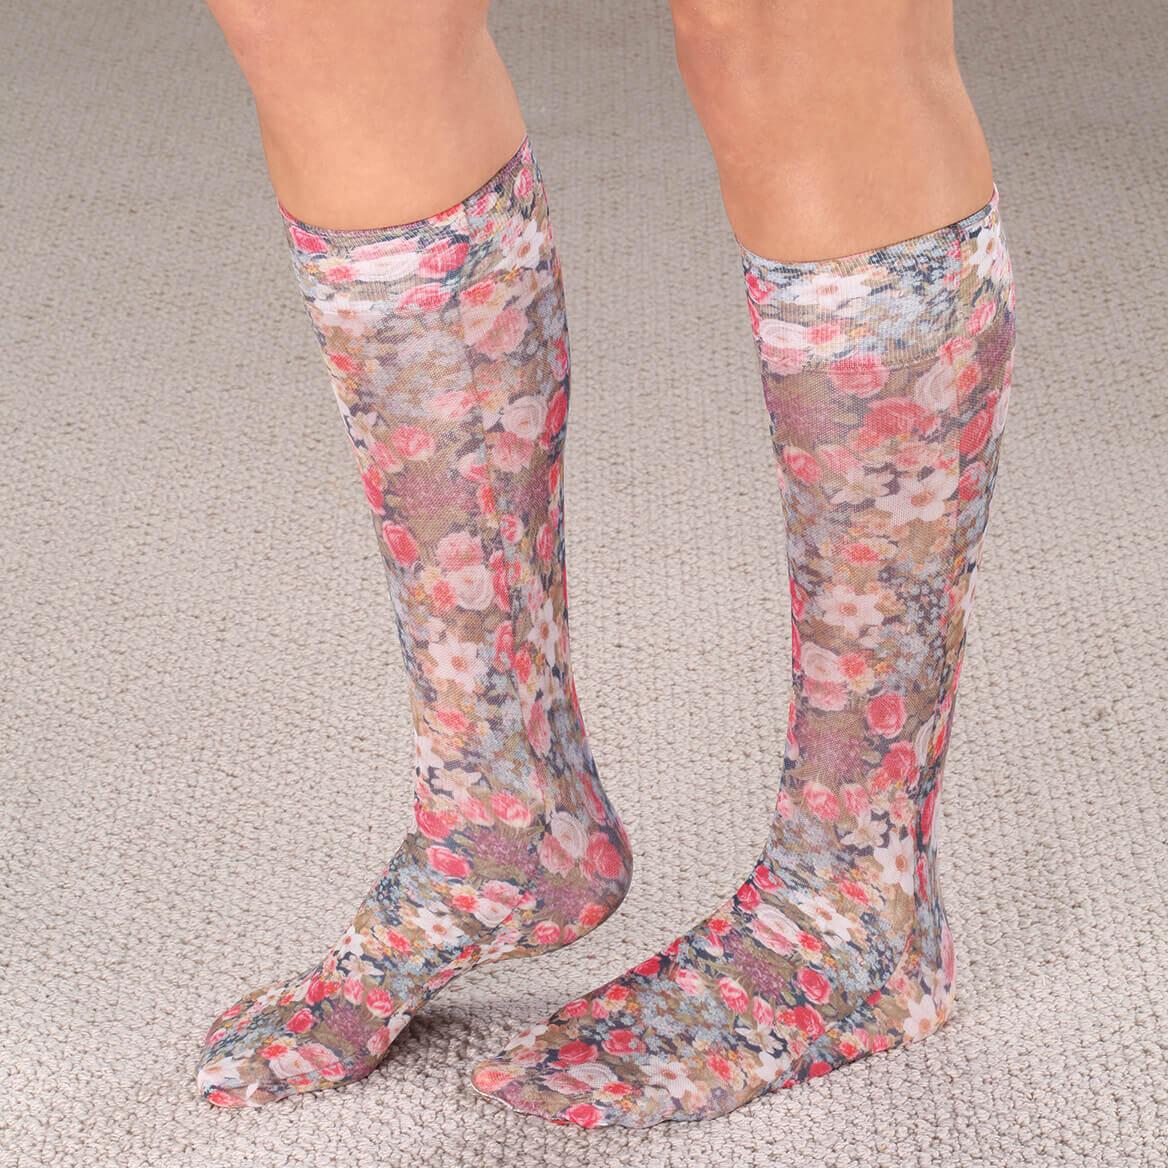 dd5813d87c Celeste Stein Compression Socks, 15-20 mmHg - Miles Kimball